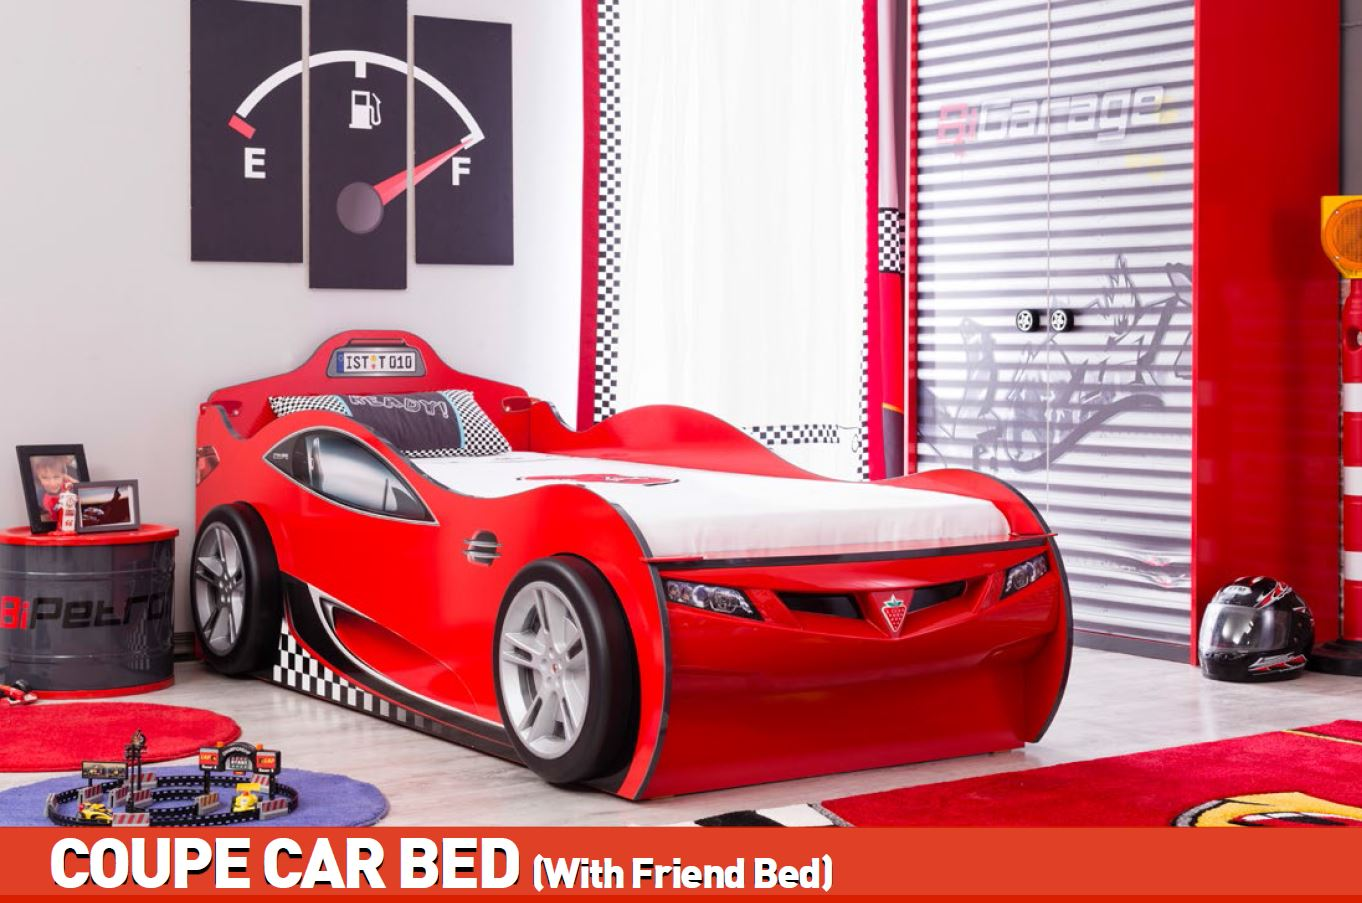 cilek coupe autobett kinderbett bett ausziehbett. Black Bedroom Furniture Sets. Home Design Ideas